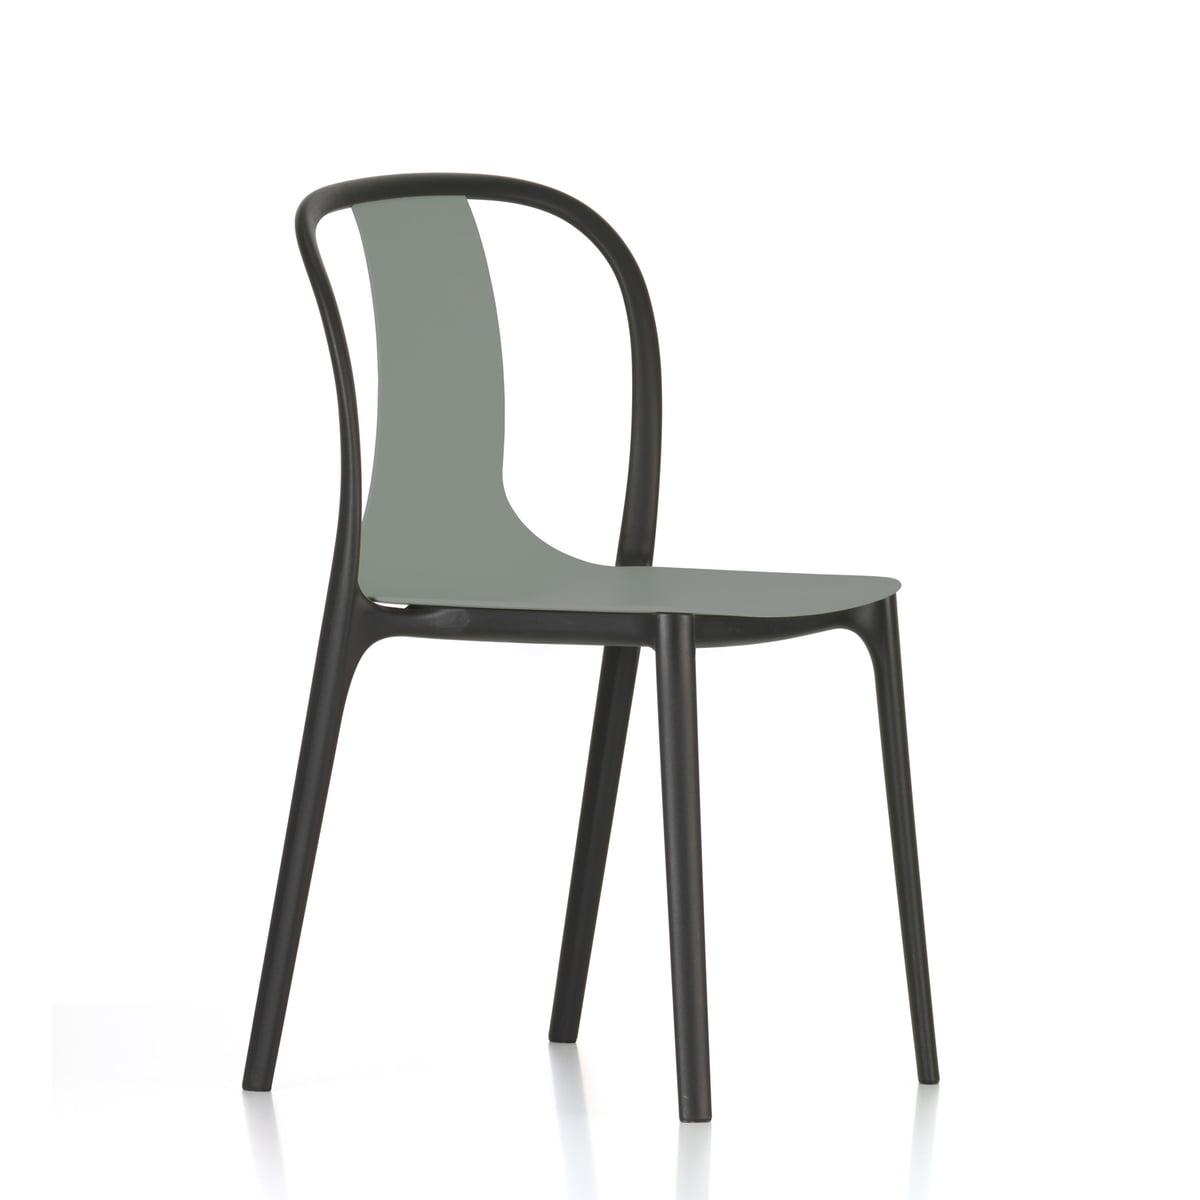 Belleville stol i plastik i interiørshoppen